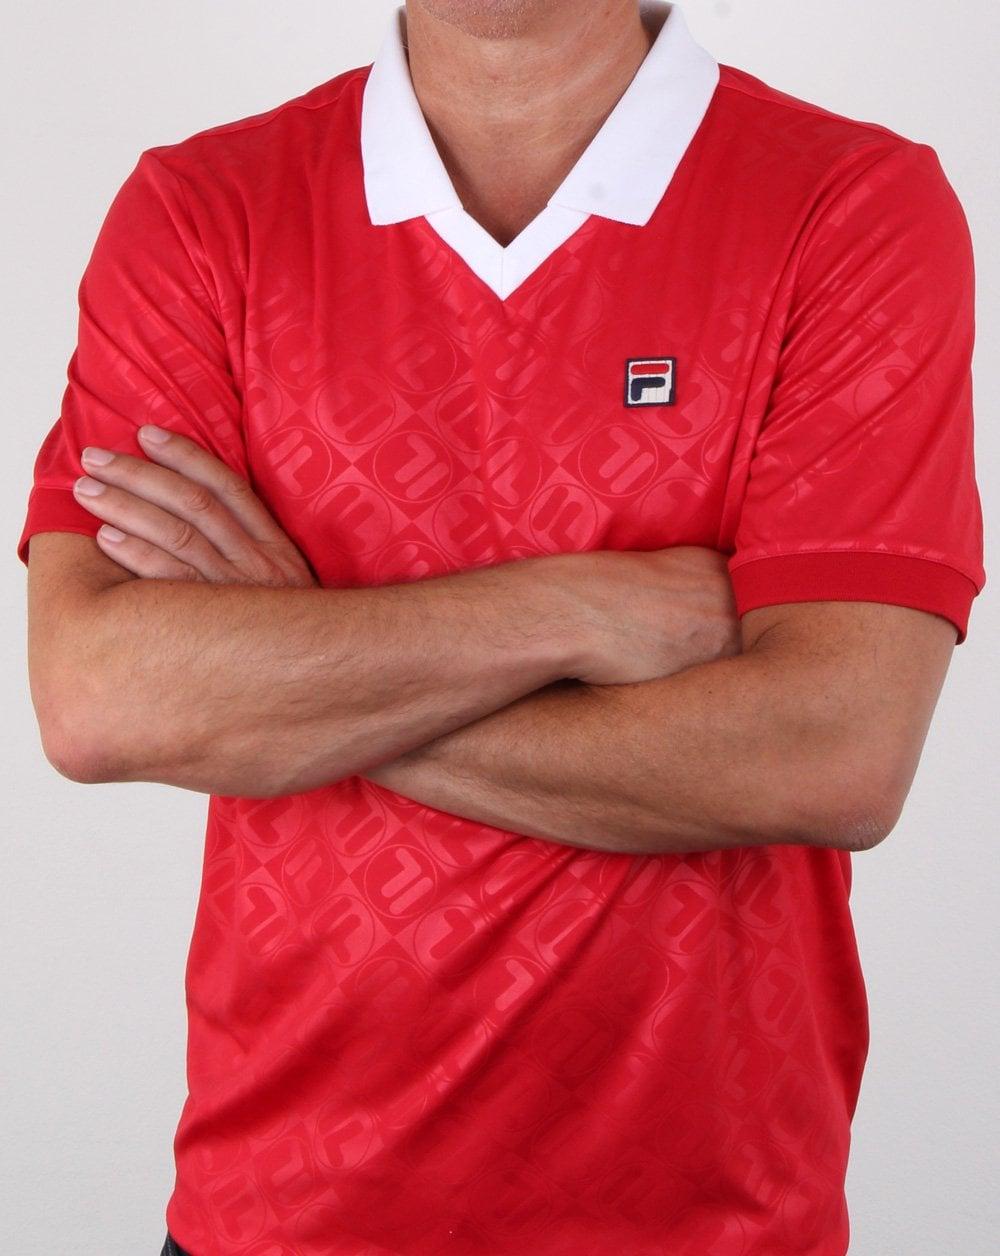 48c4760ef93 Cheap Old Season Football Shirts - Nils Stucki Kieferorthopäde